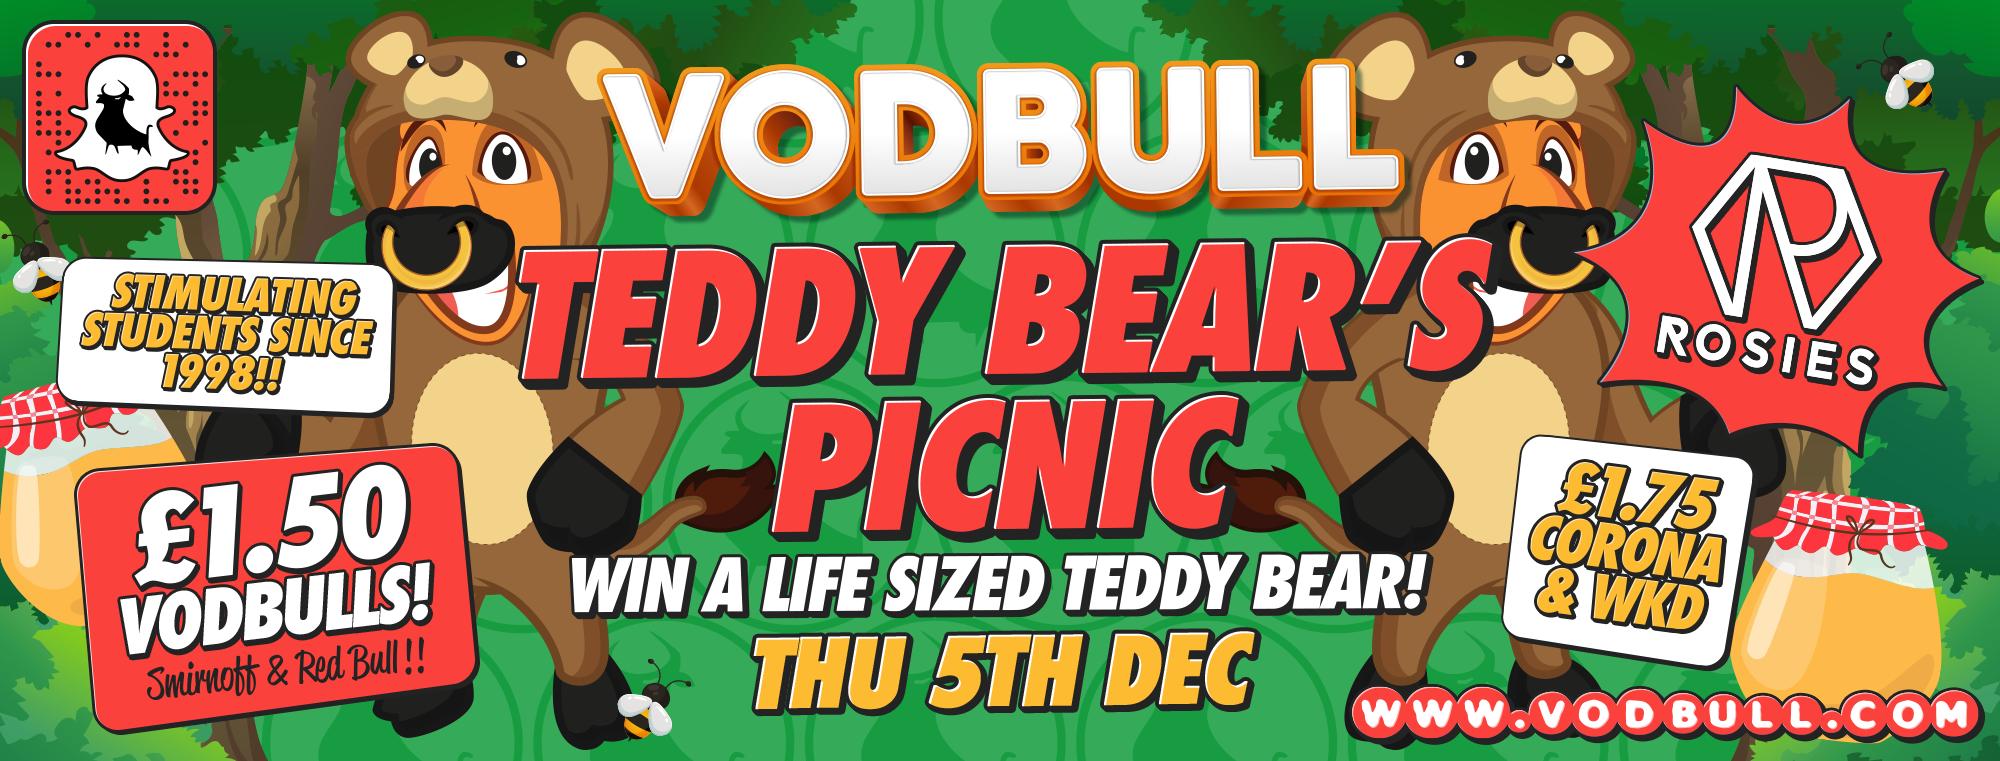 Vodbull Teddy Bears' Picnic!!